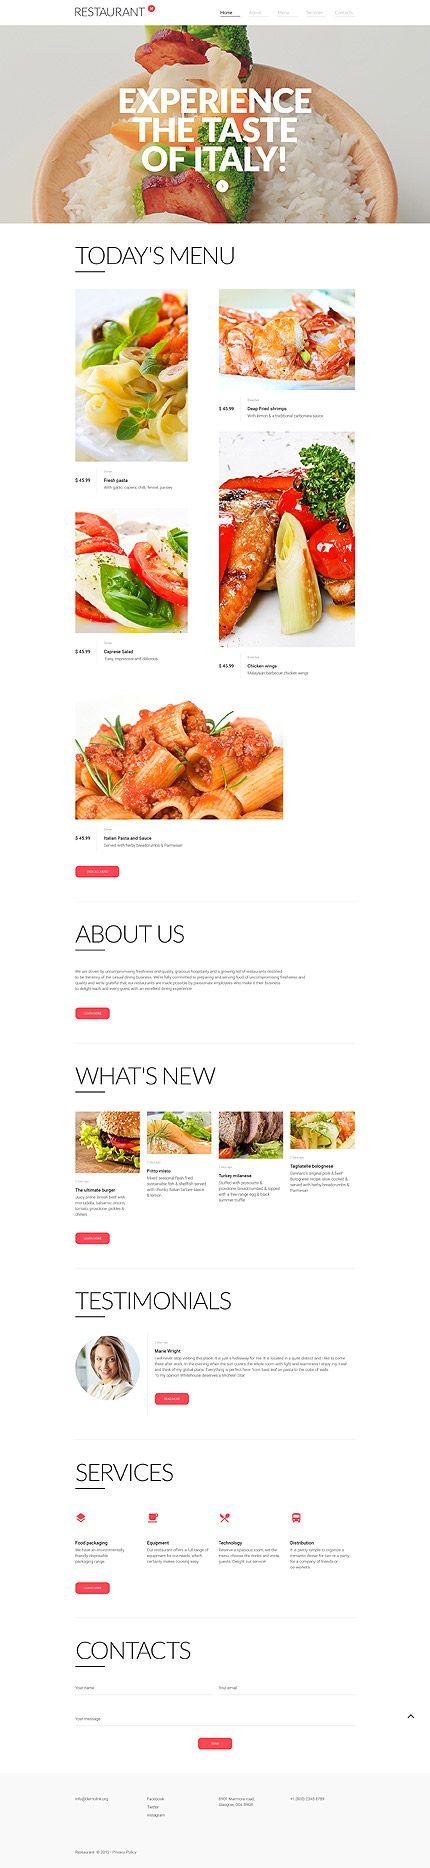 The Best Restaurant Website Templates Ideas On Pinterest